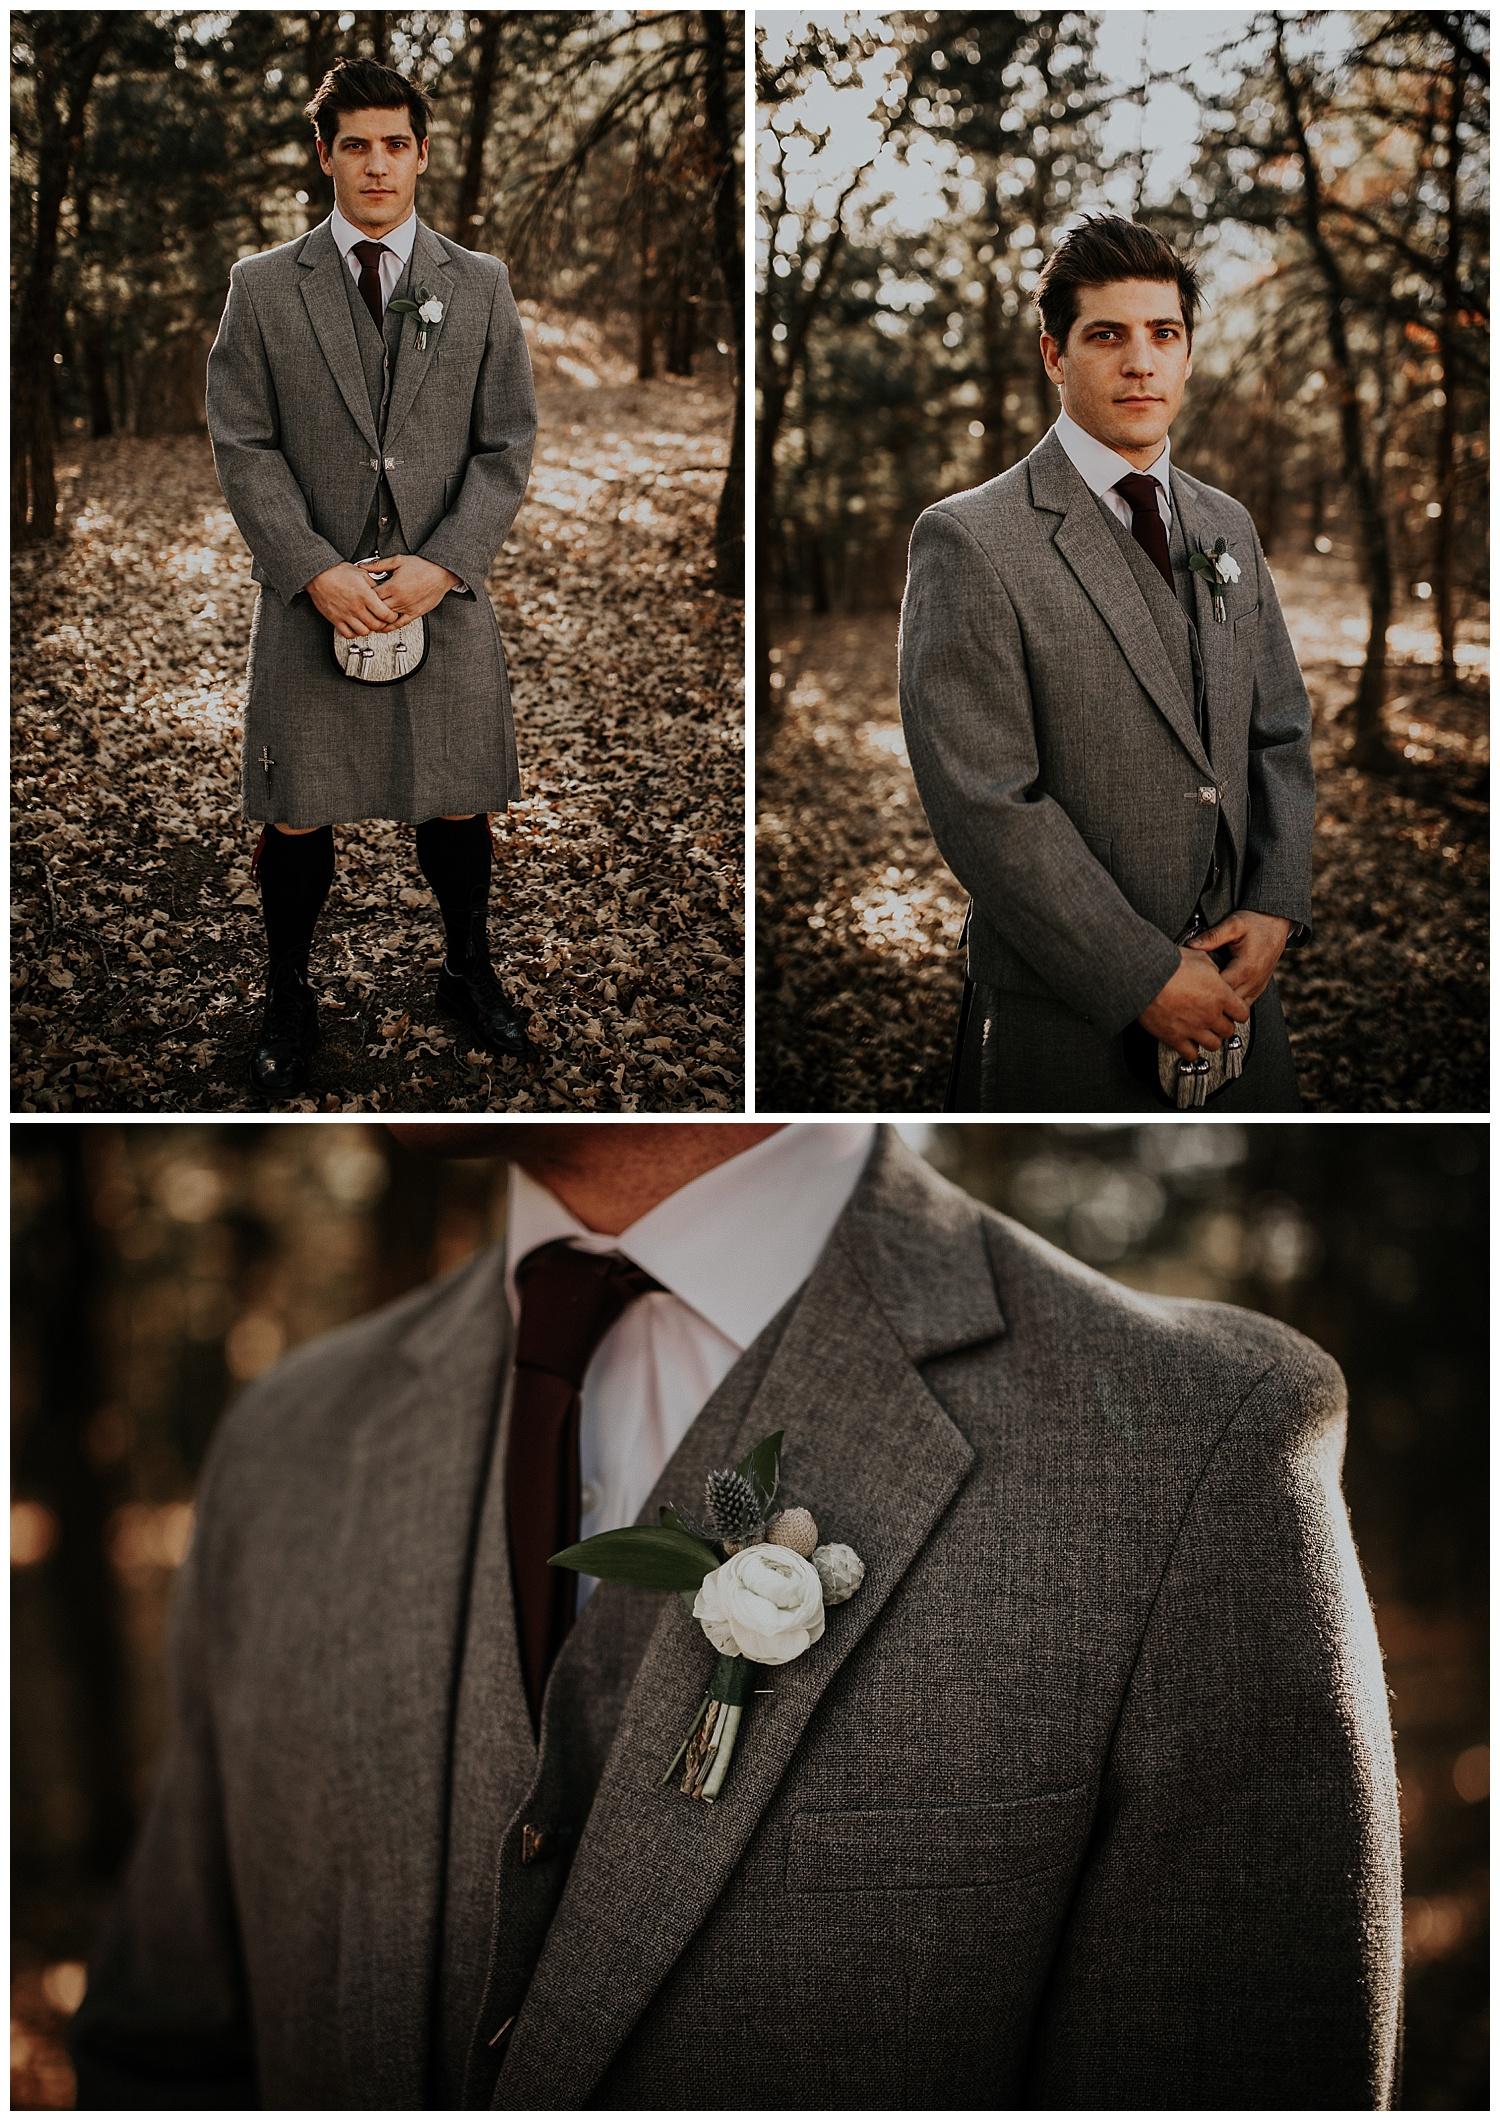 Laken-Mackenzie-Photography-Palm-Whispering-Oaks-Wedding-Venue-Dallas-Wedding-Photographer21.jpg